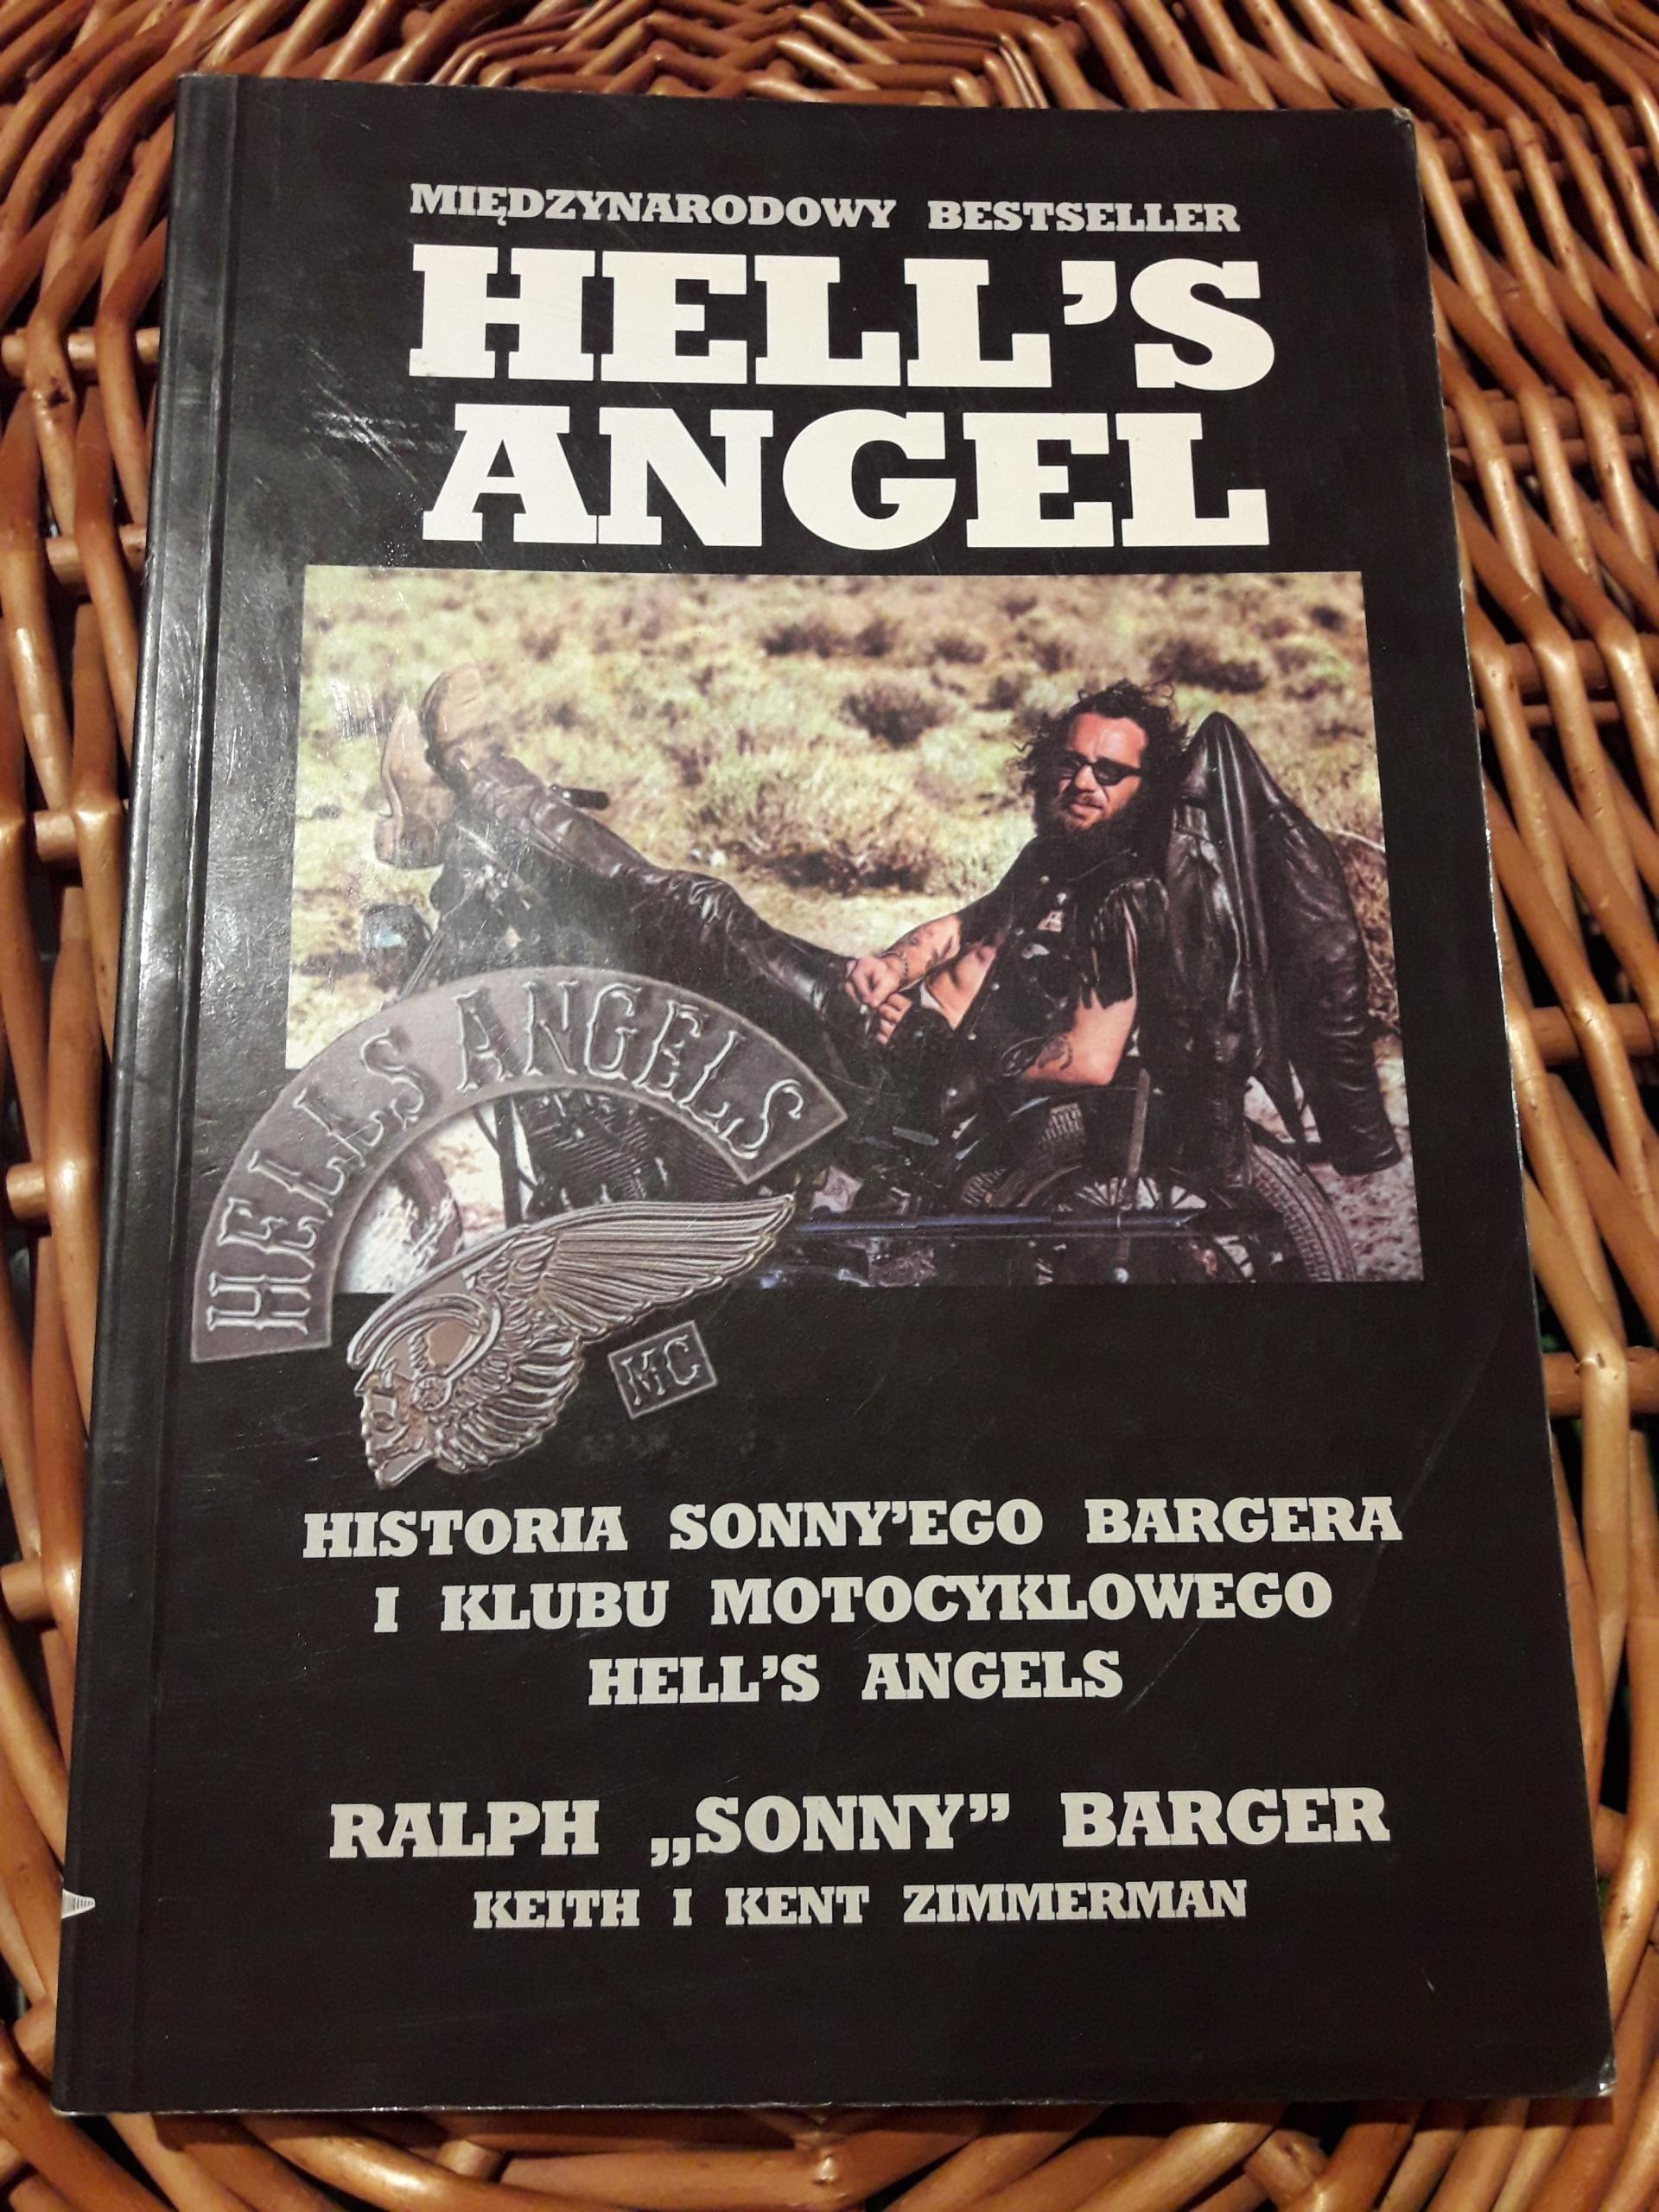 HELLS ANGEL HELLS ANGELS HISTORIA KLUBU HARLEY